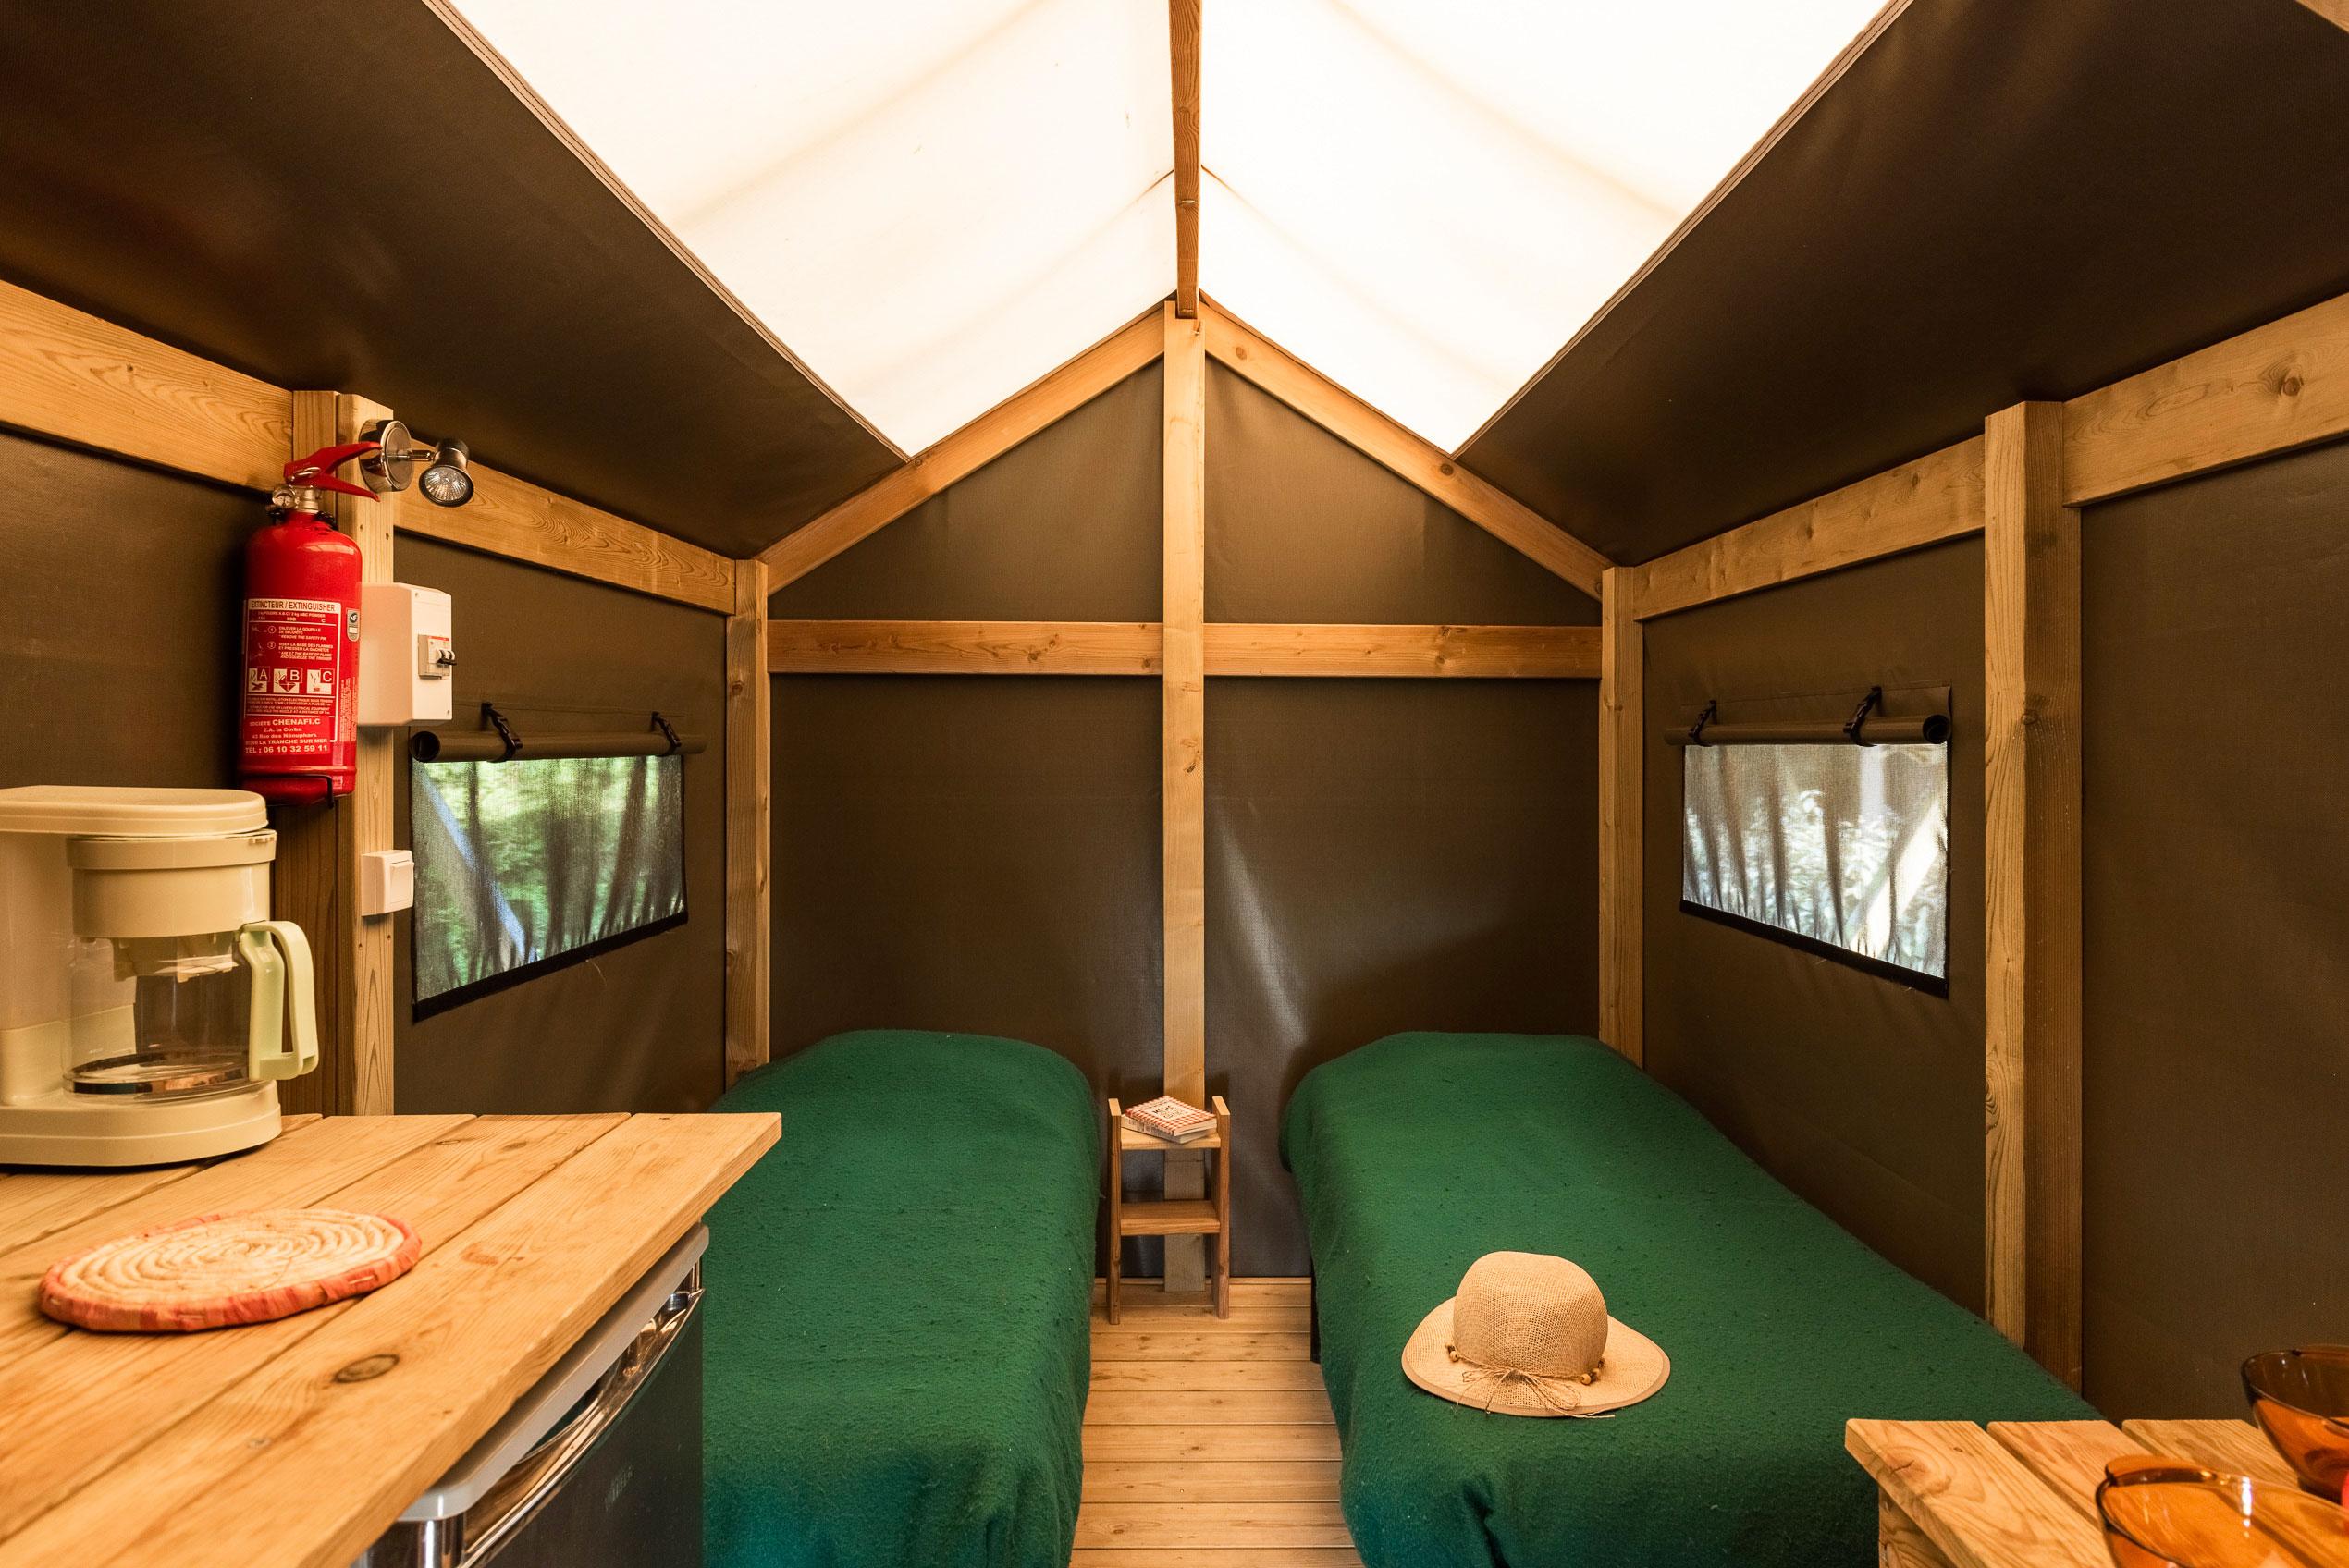 galerie-photos-camping-avec-tente-lodge-2-pers-lits-camping-le-port-de-moricq